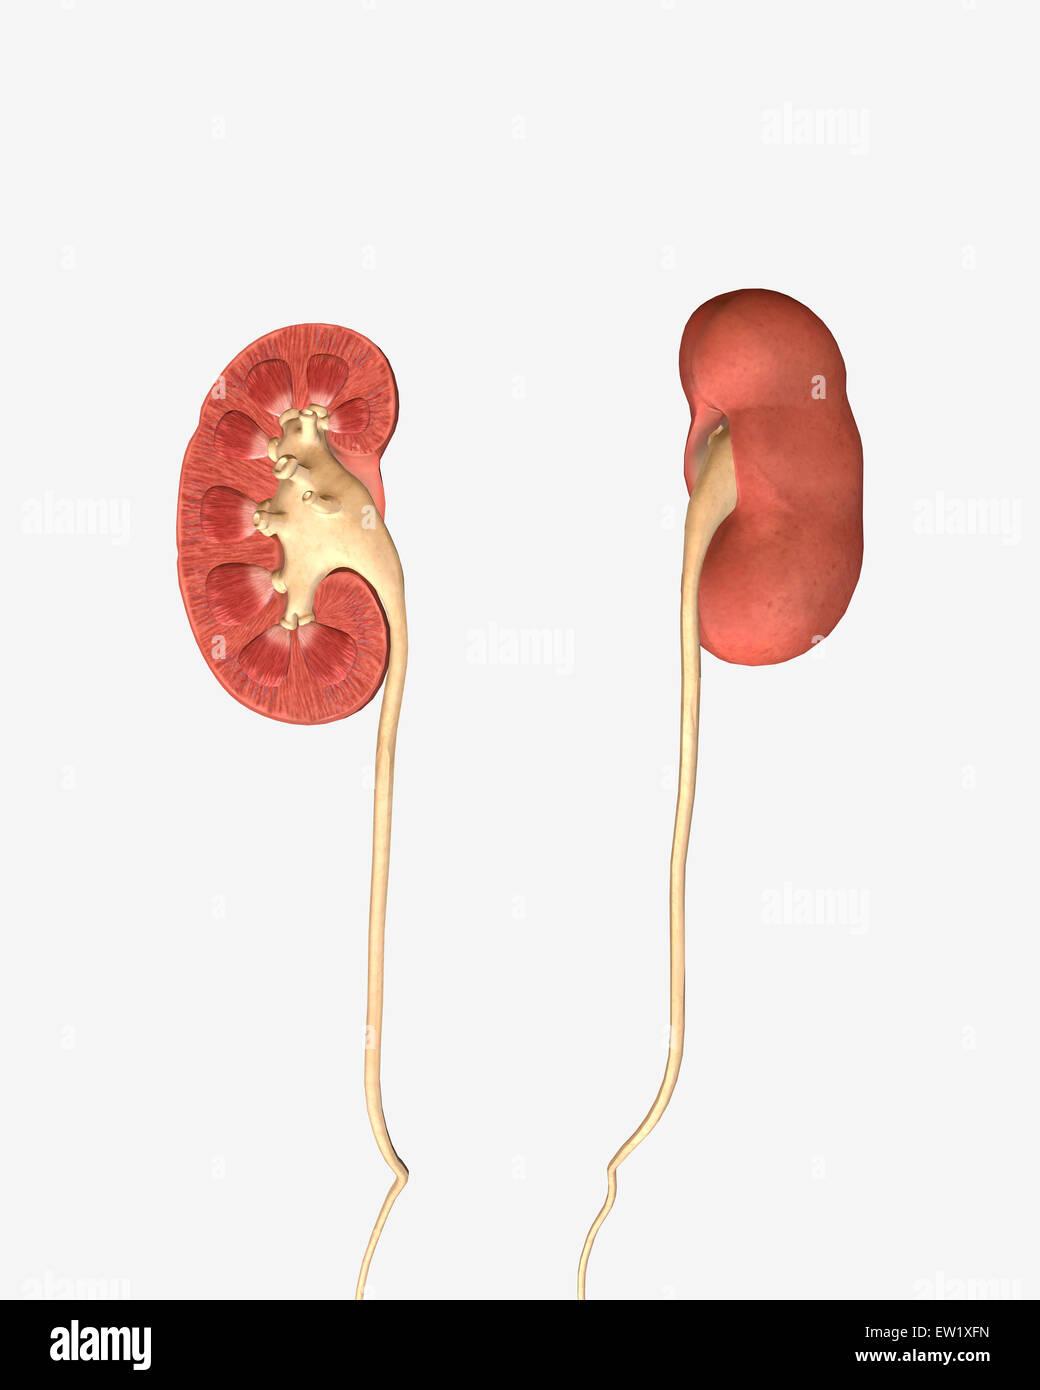 Ureter Stock Photos Ureter Stock Images Alamy